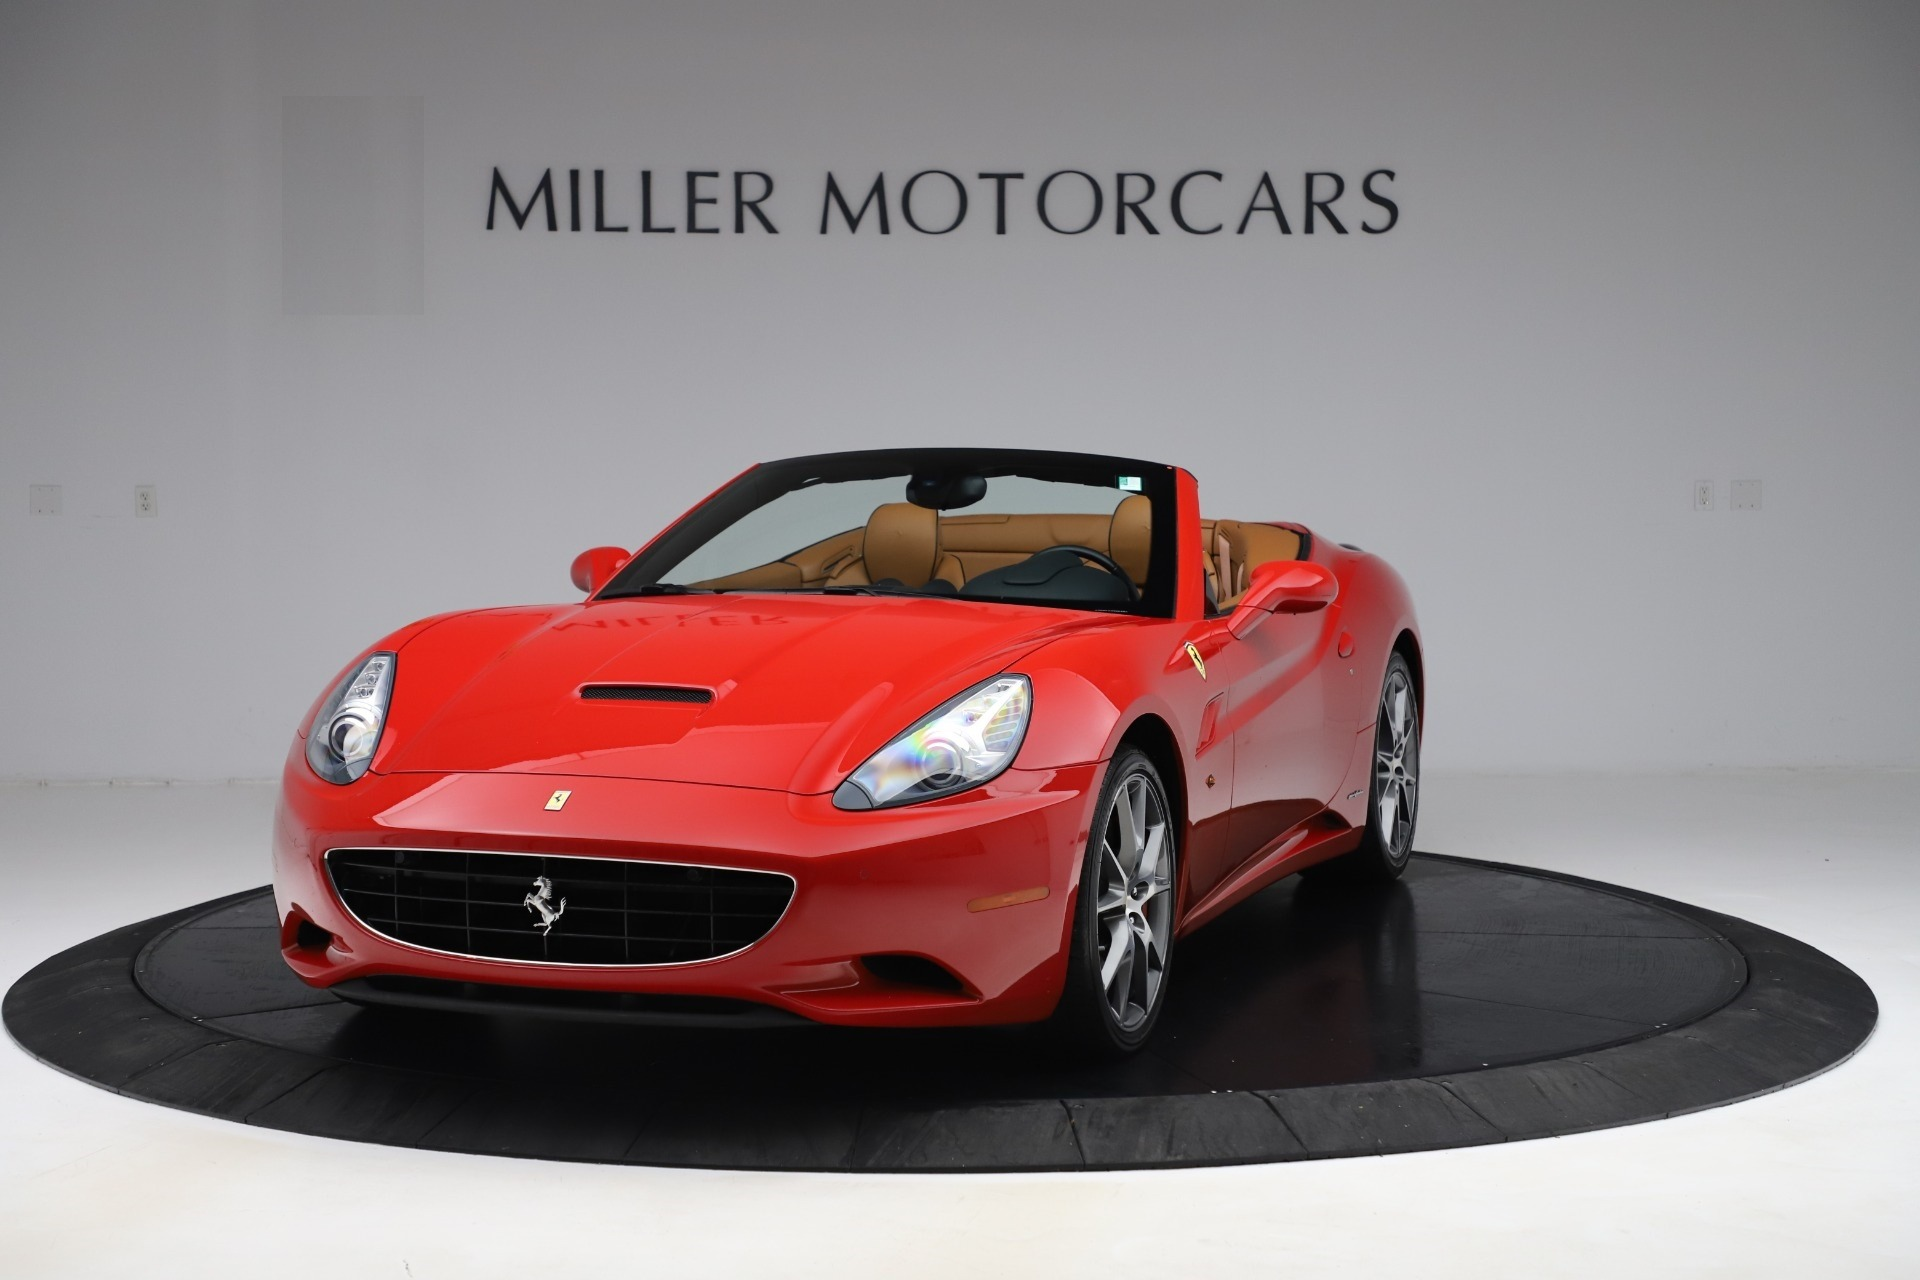 Used 2013 Ferrari California 30 for sale Sold at Maserati of Greenwich in Greenwich CT 06830 1